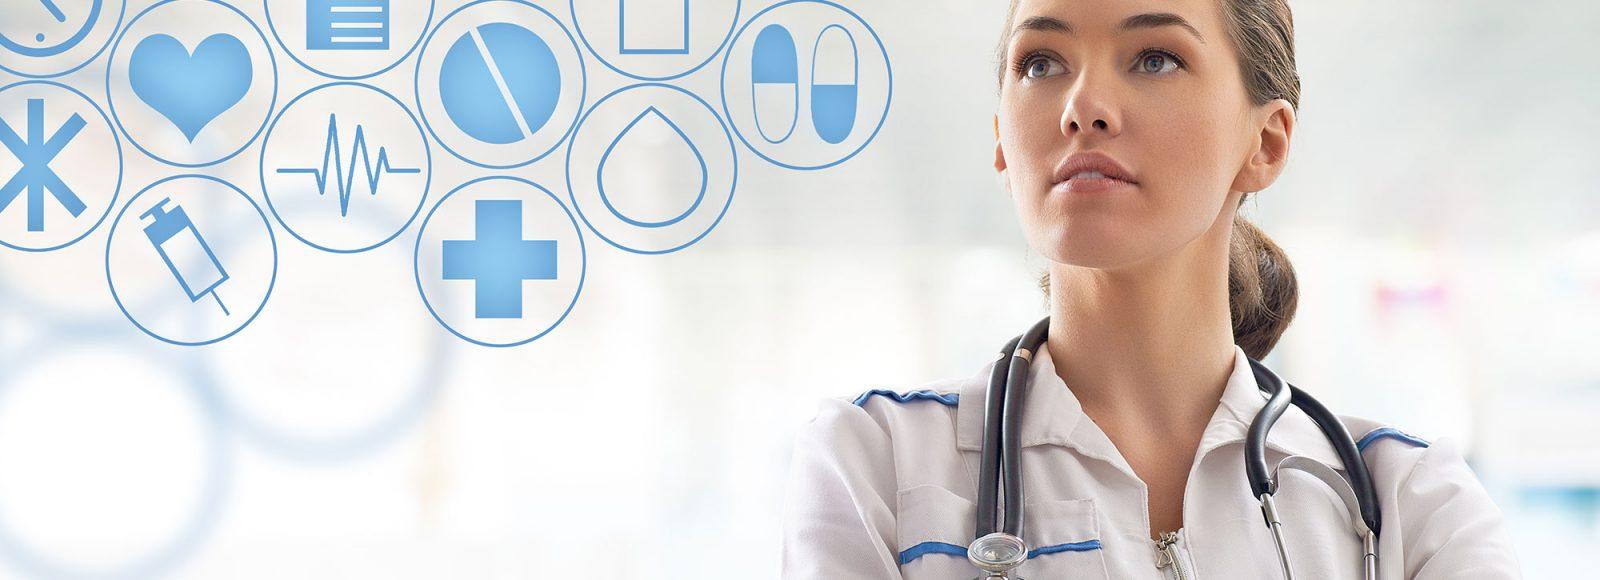 Medicaltech1